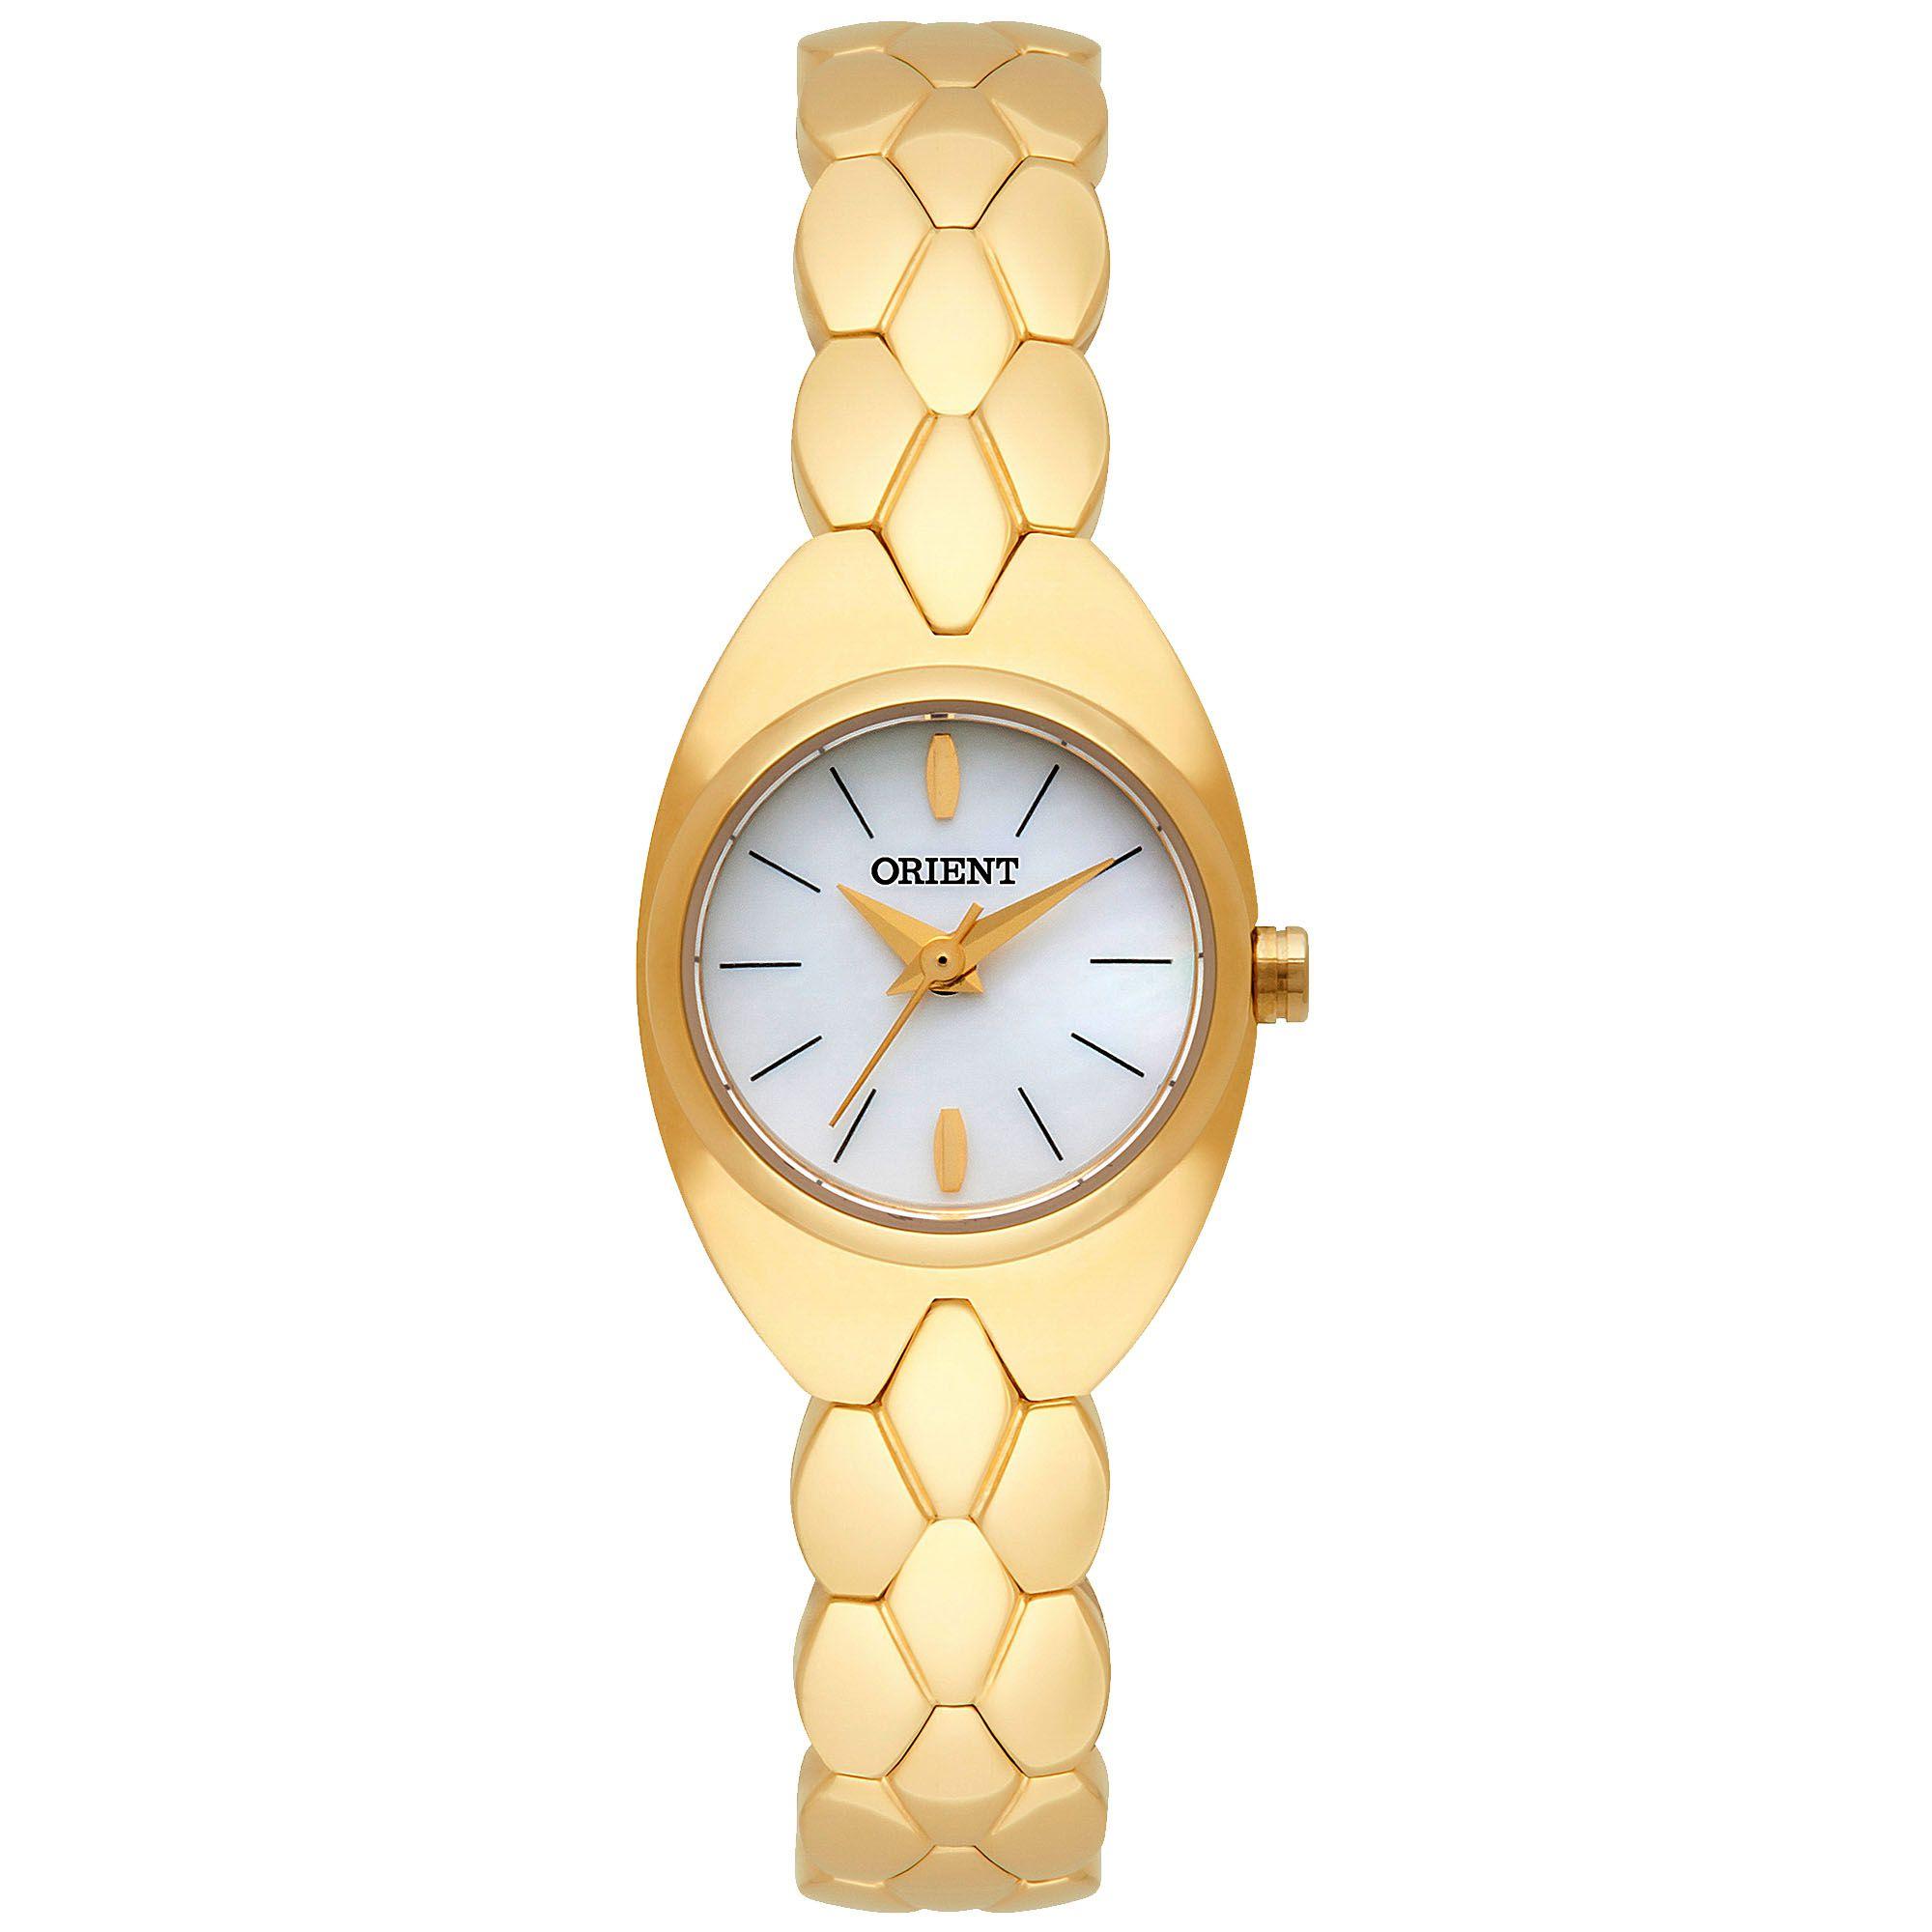 Relógio Feminino Orient FGSS0087 B1KX